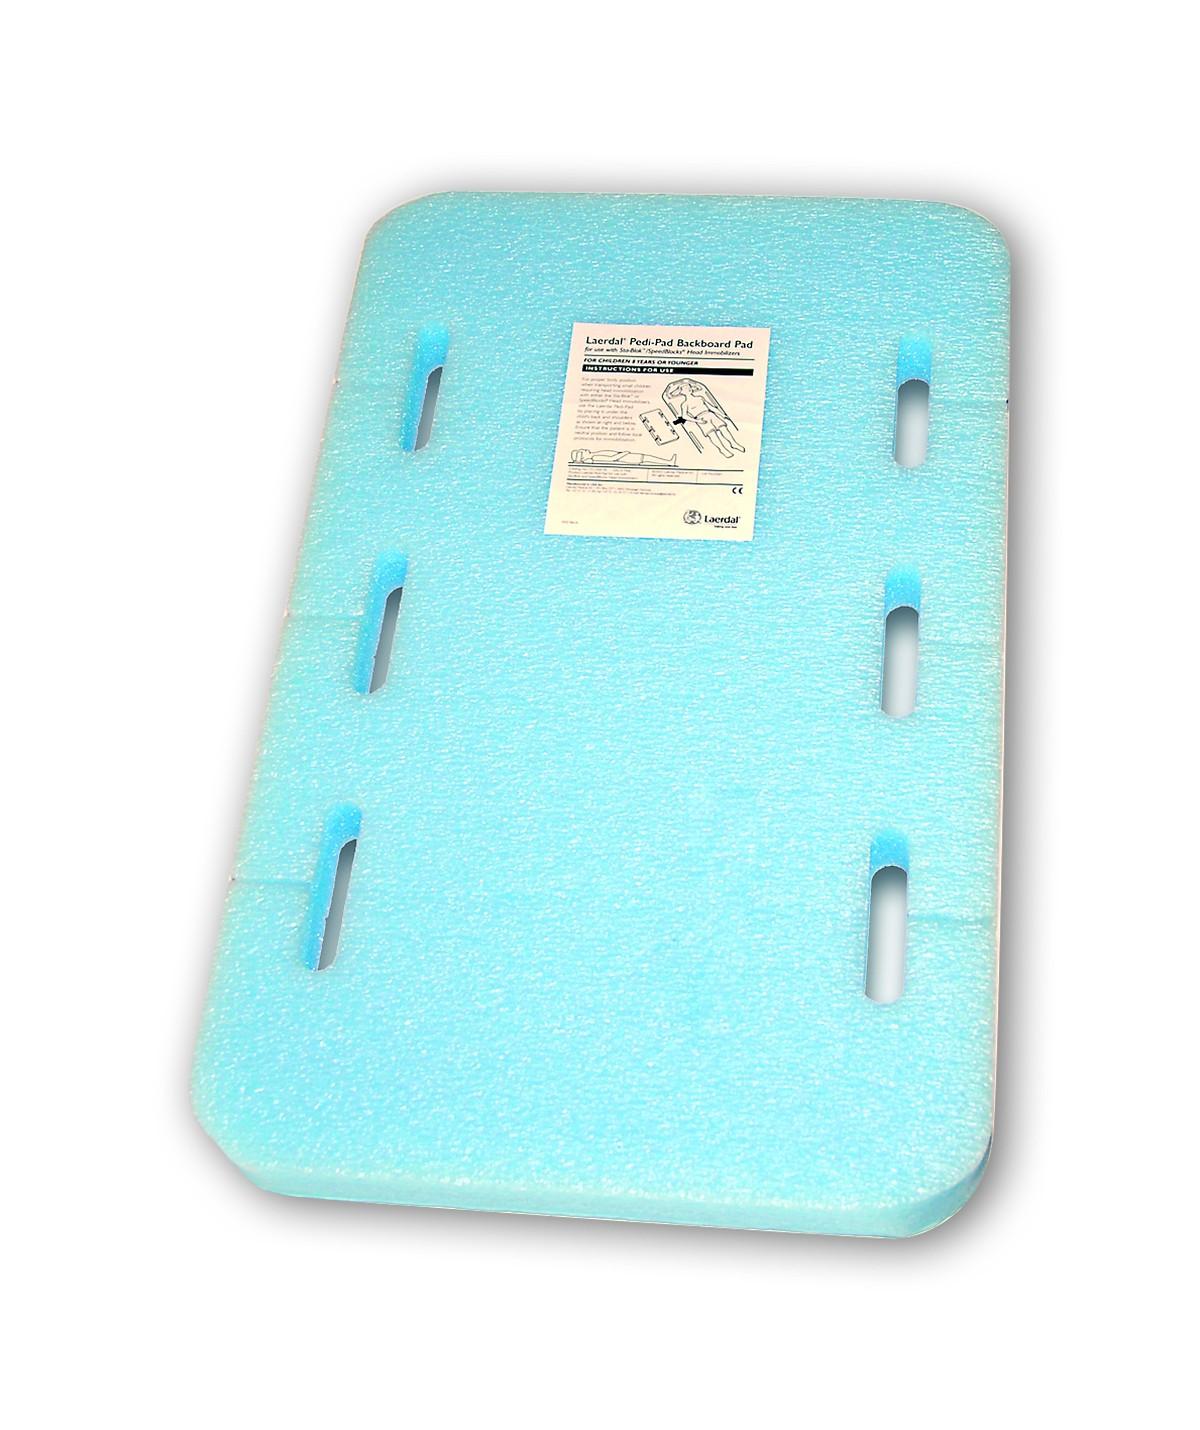 Laerdal Paedi-Pad Backboard Pad für Kinder, Packung â 6 Stück